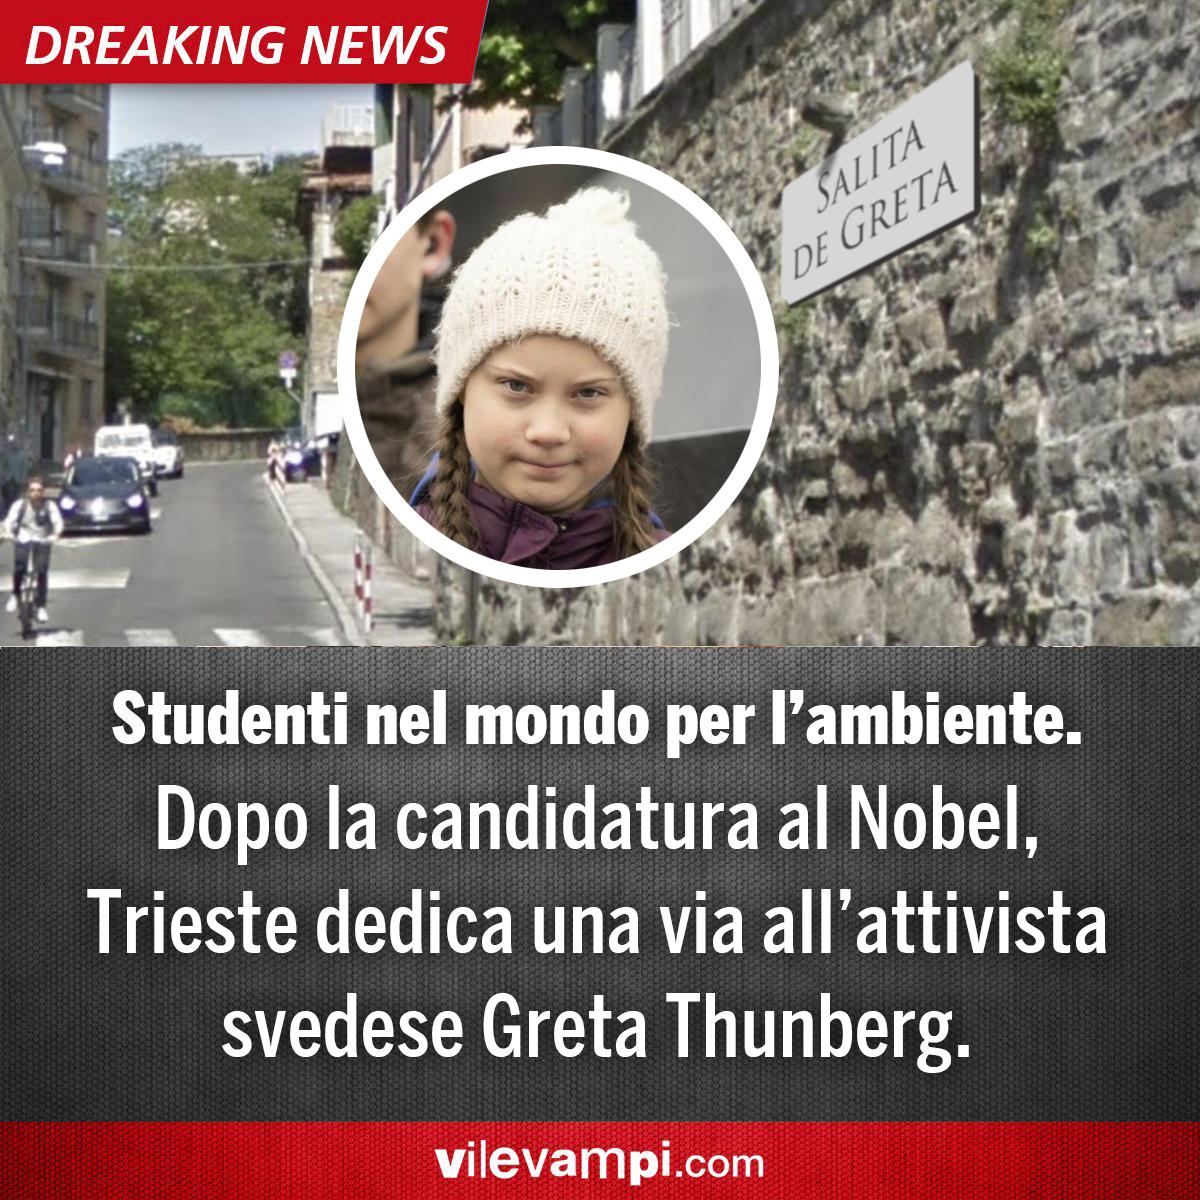 2019_Drek_news_Greta